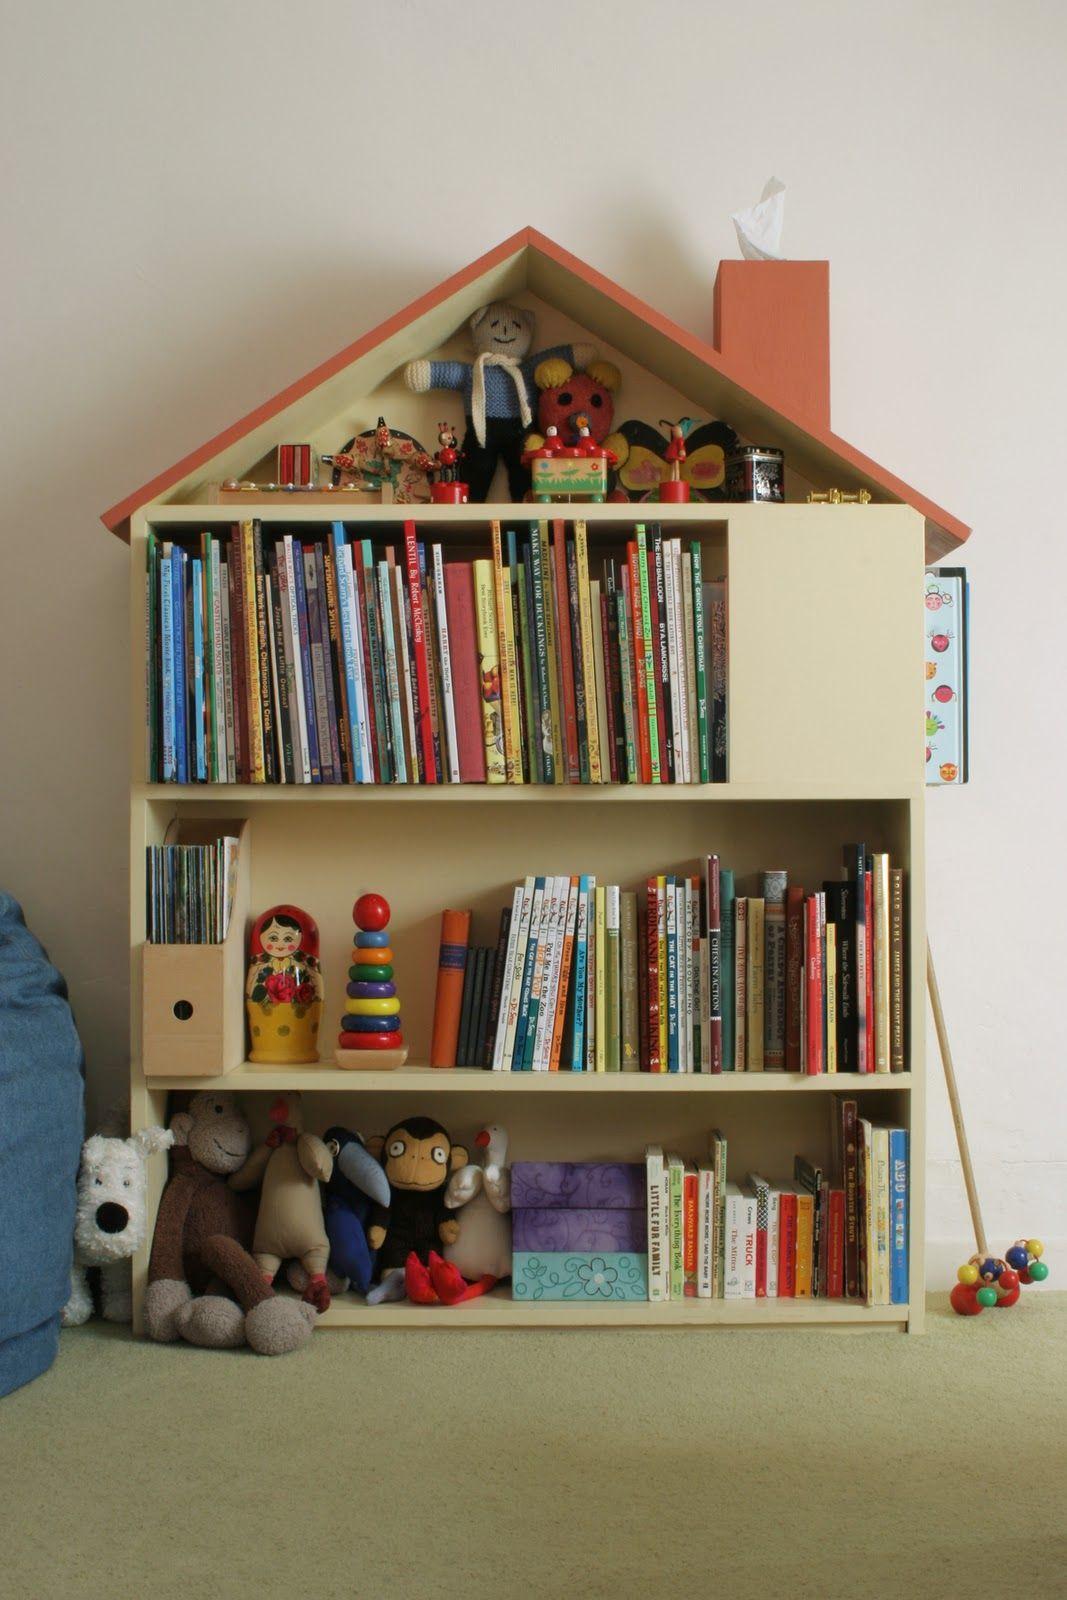 House Bookshelf. Love the chimney idea!